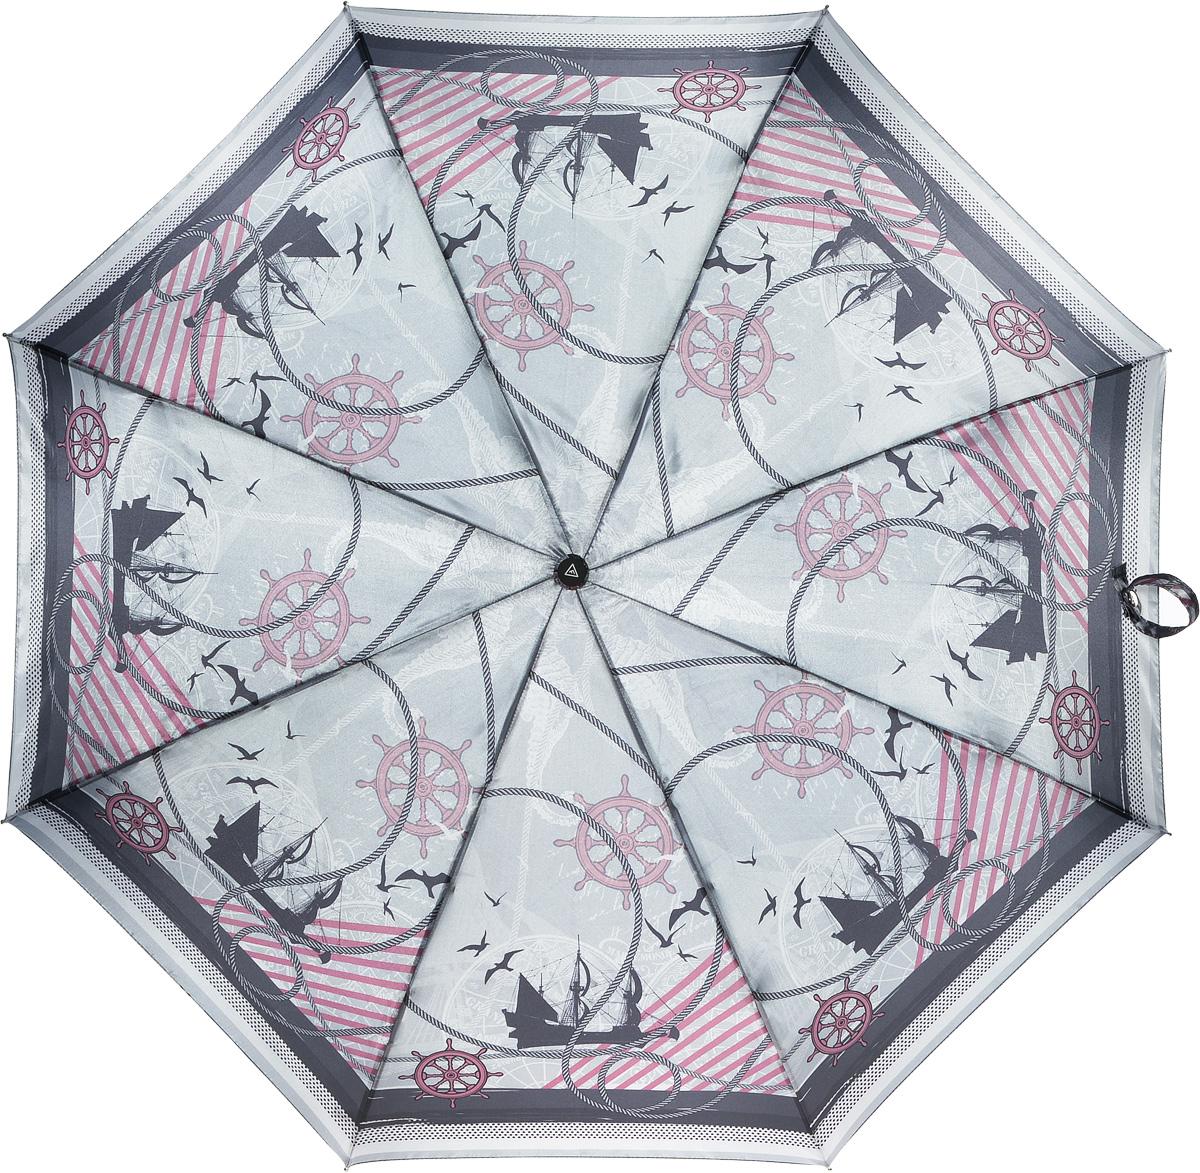 Зонт женский Fabretti, автомат, 3 сложения. L-16104-5L-16104-5Зонт женский Fabretti, облегченный суперавтомат, 3 сложения